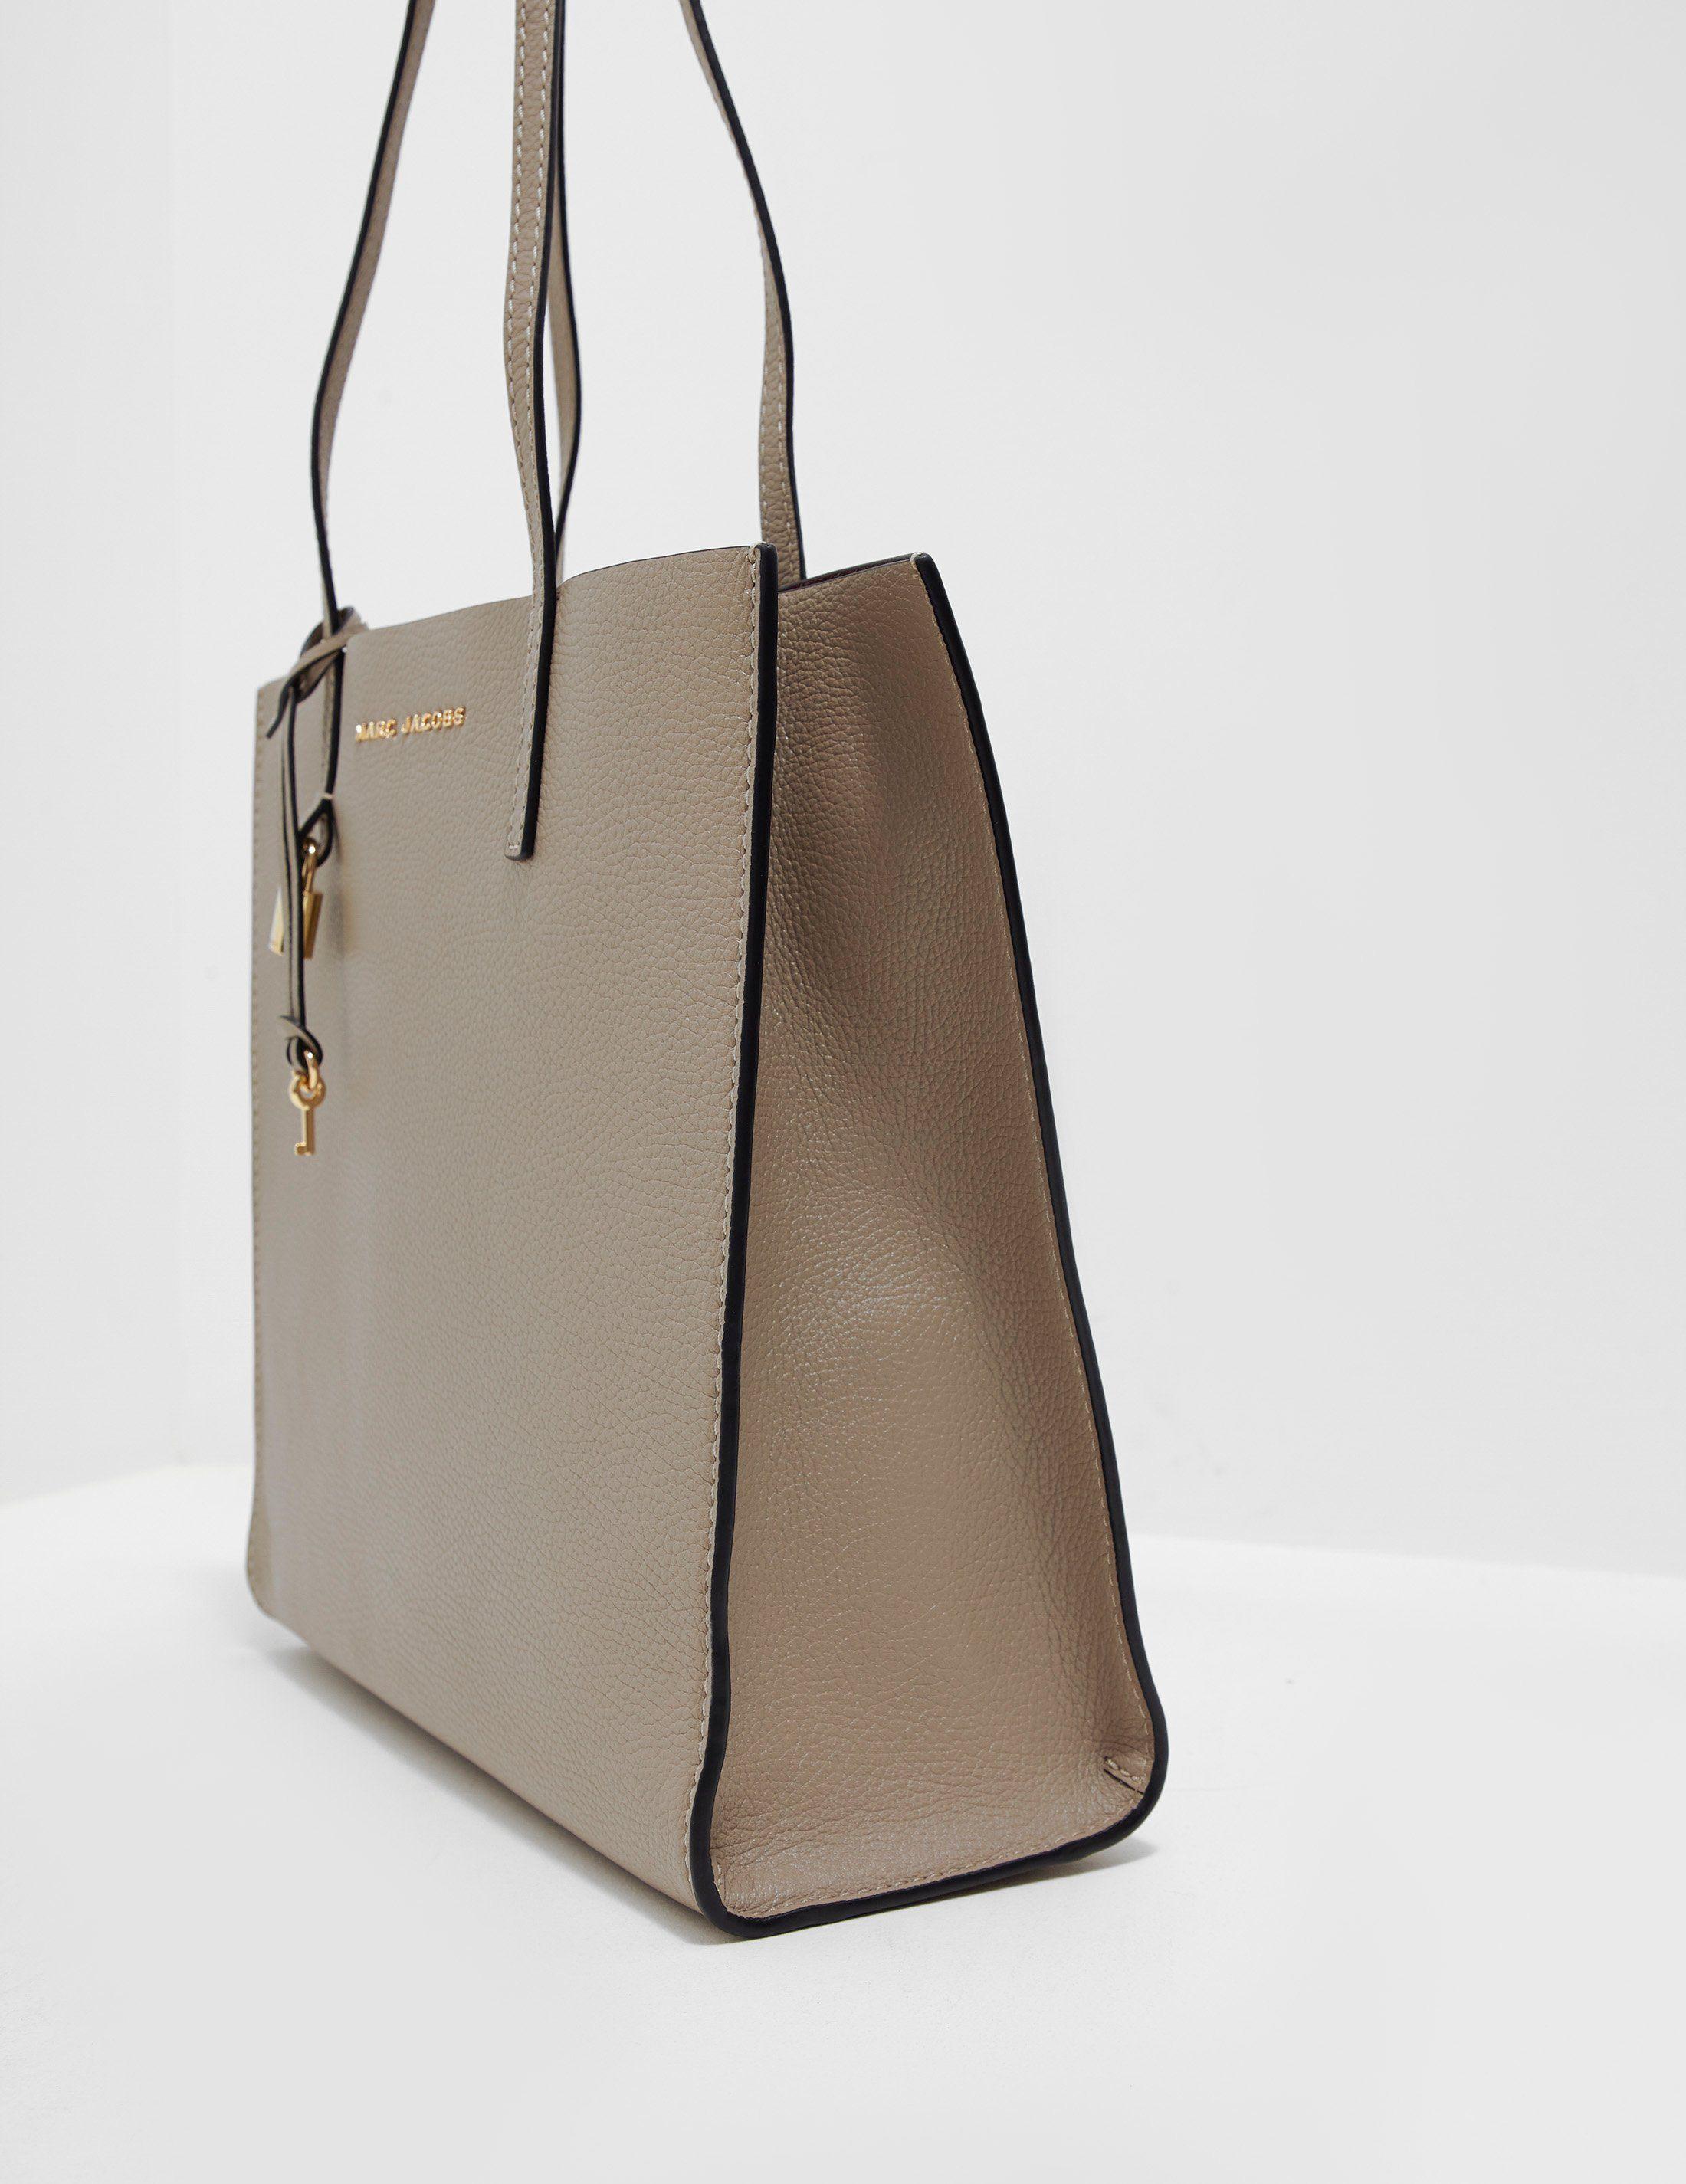 Marc Jacobs Grind Tote Bag